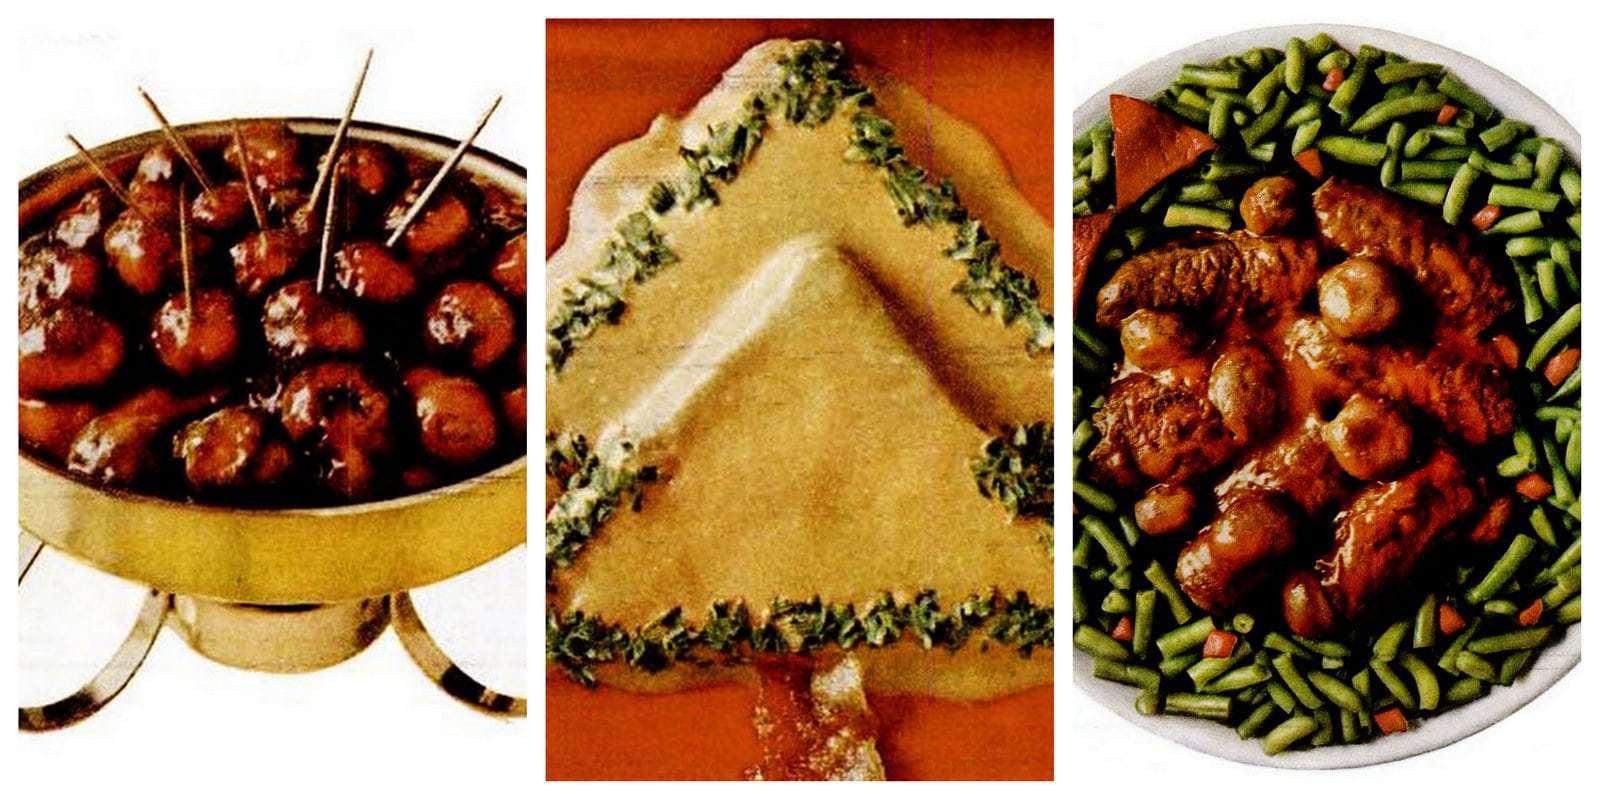 Christmas recipes - Campbell's Santa Sauce recipe (1969)